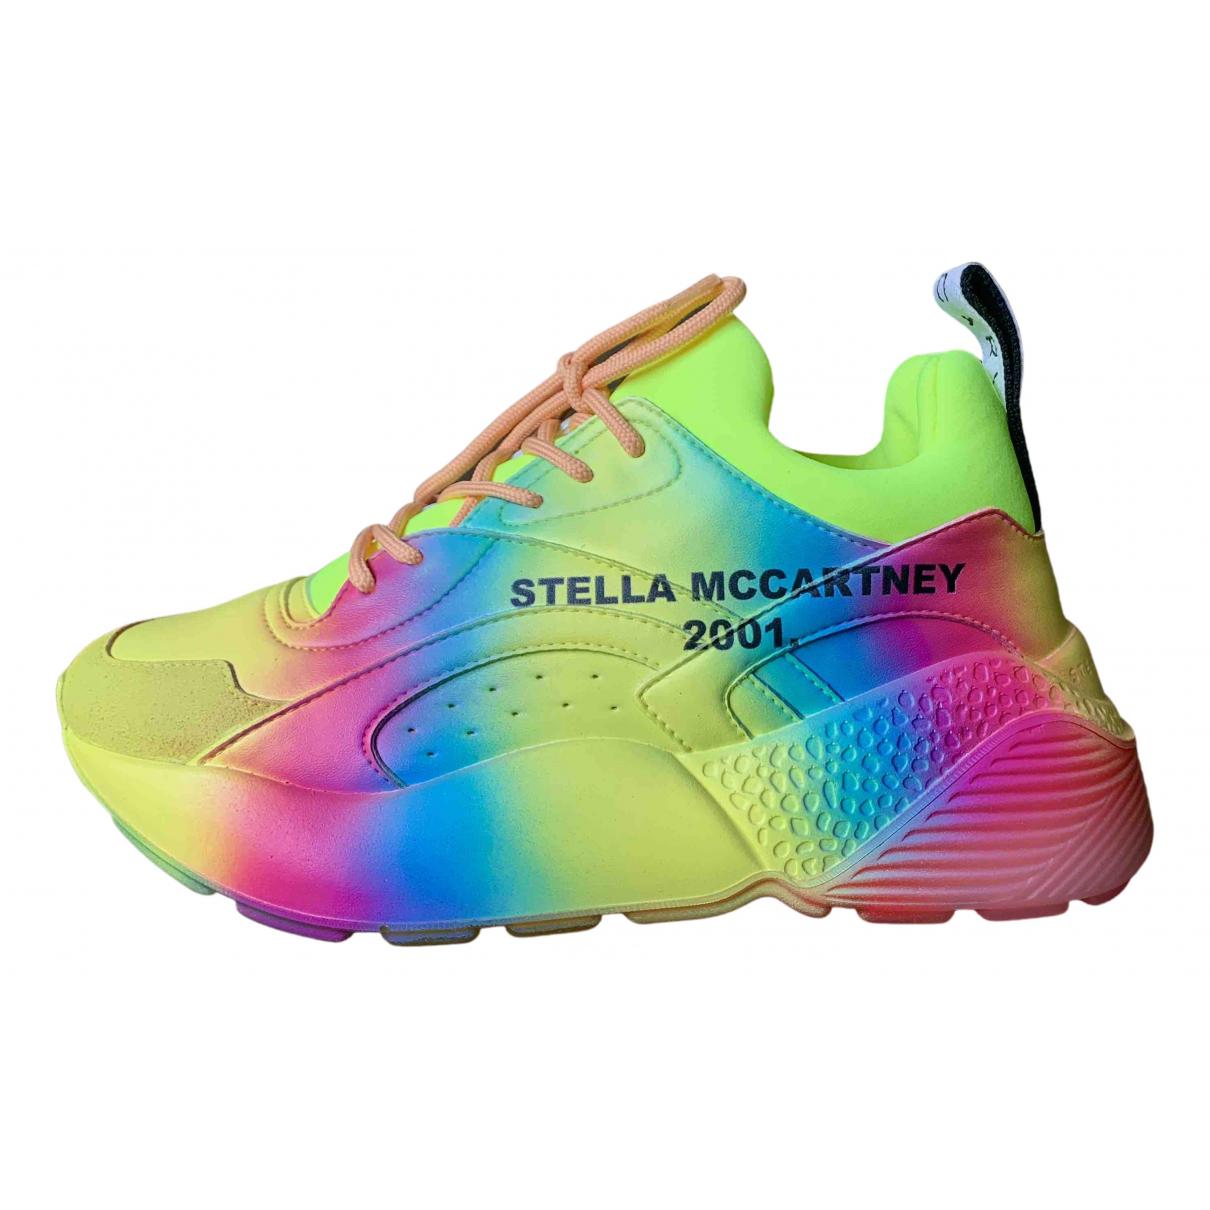 Stella Mccartney Eclypse Multicolour Cloth Trainers for Women 37 IT